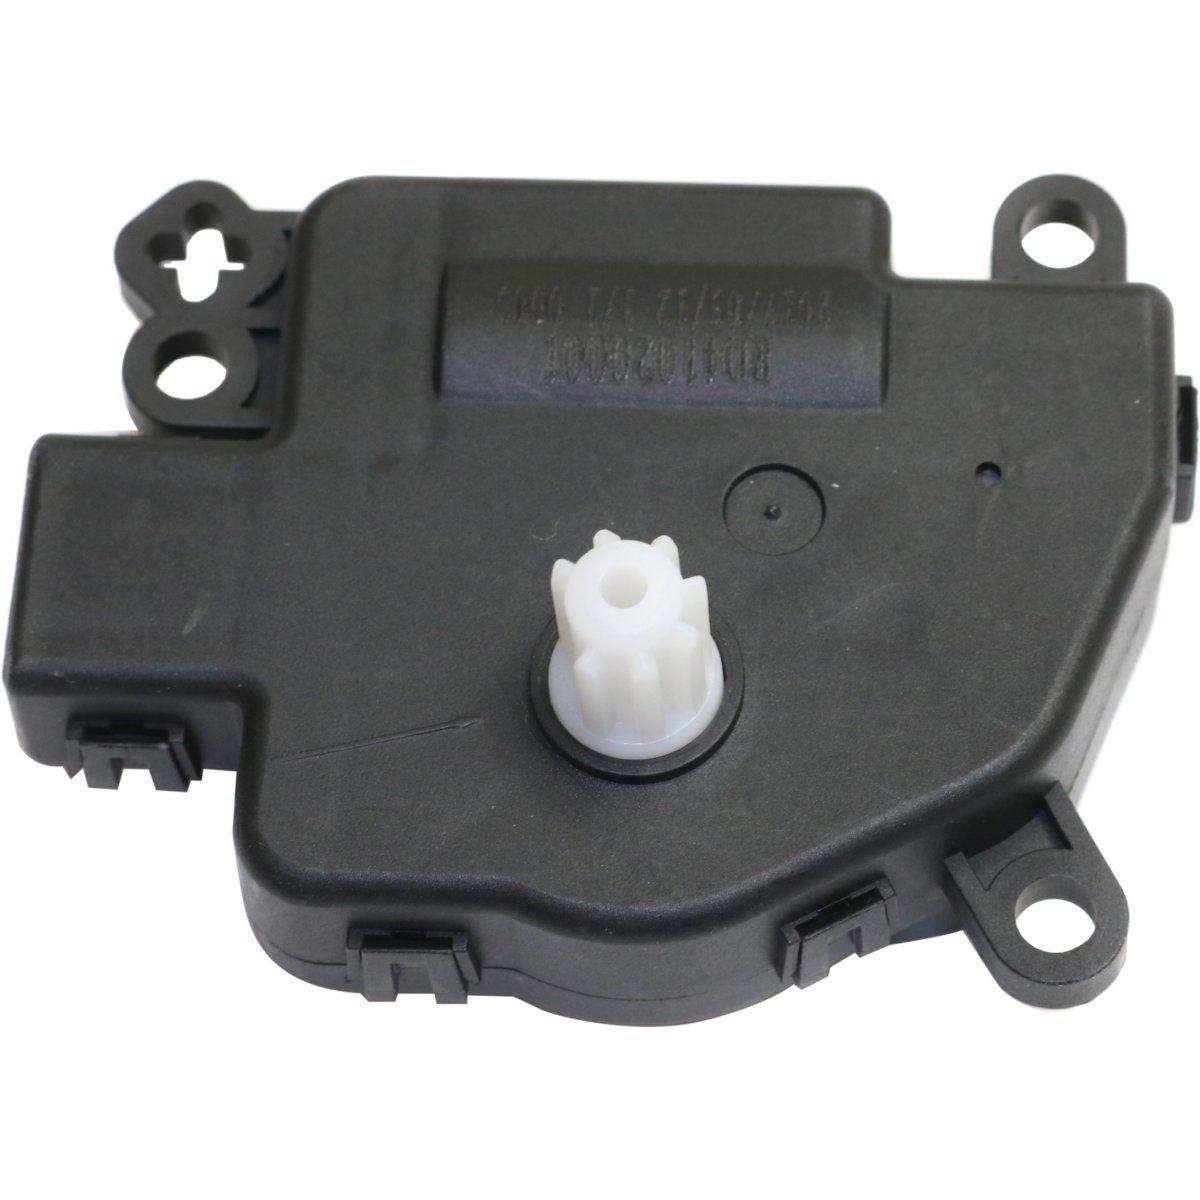 Okay Motor The Largest Auto Parts Dodge Ram 1500 Blend Door Actuator Hvac Heater Air For 2500 3500 4500 68089742aa